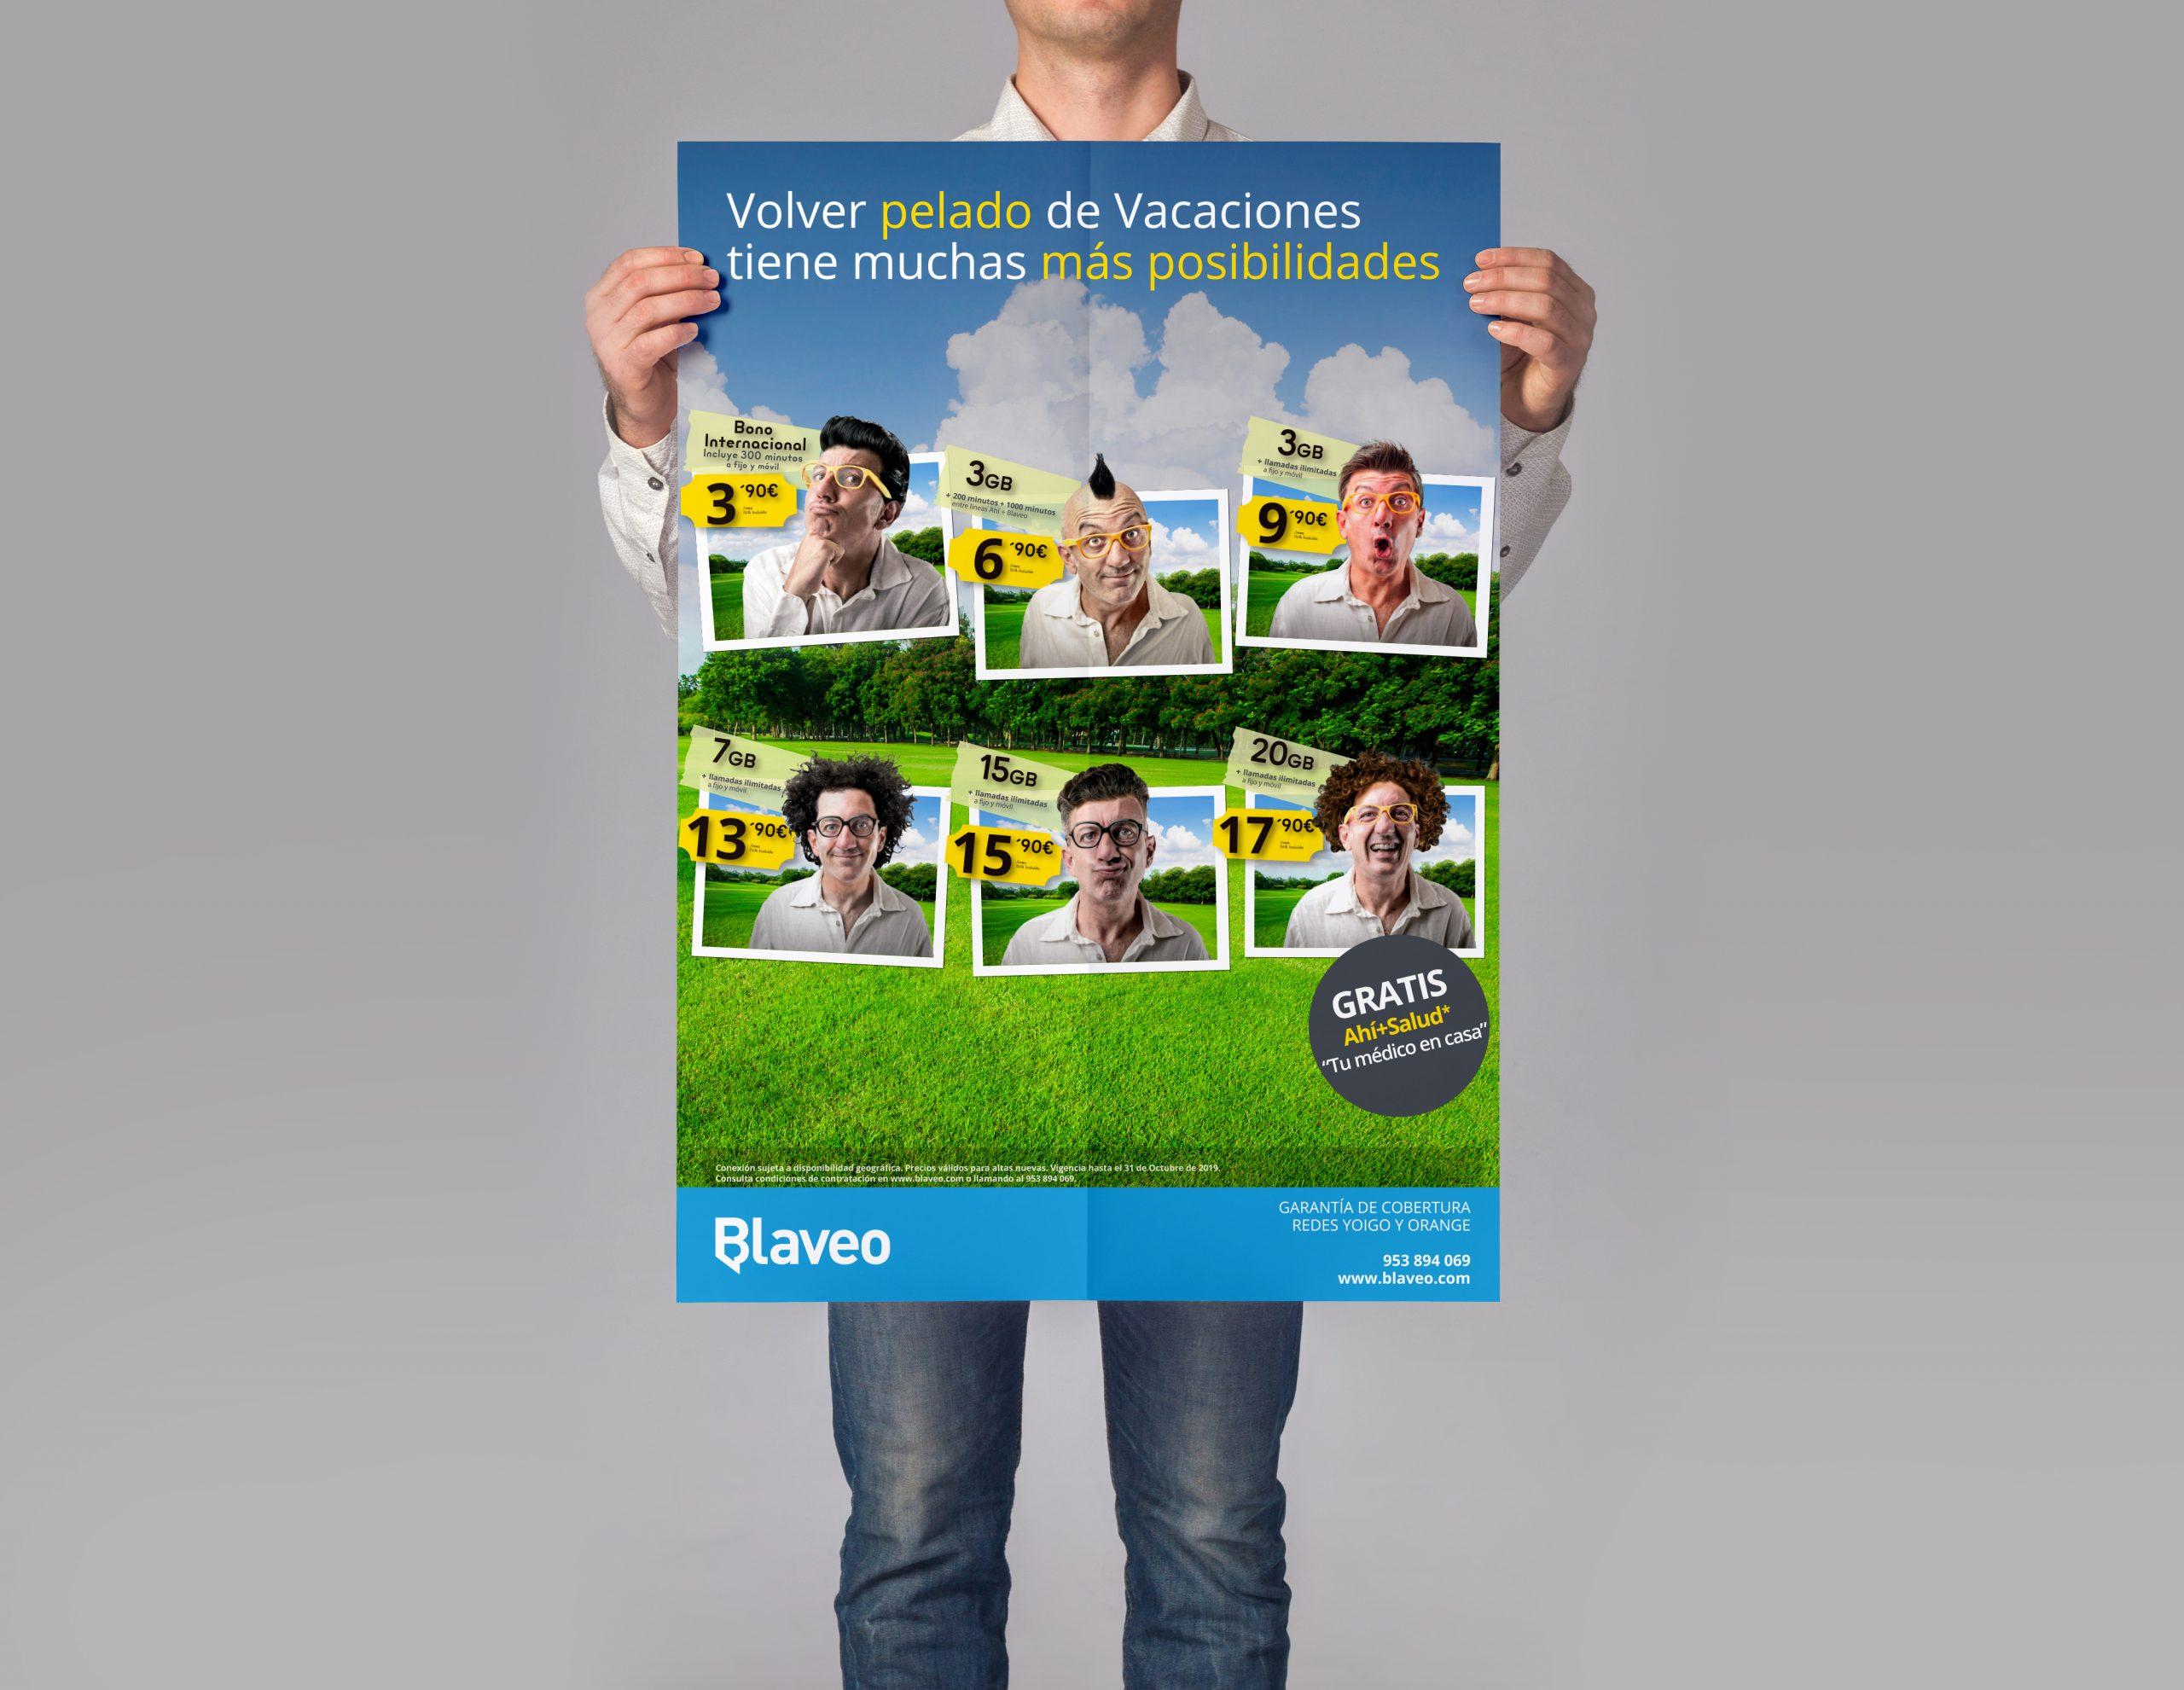 Diseño de carteles publicitarios 50 x 70 cm de Ahí + Blaveo